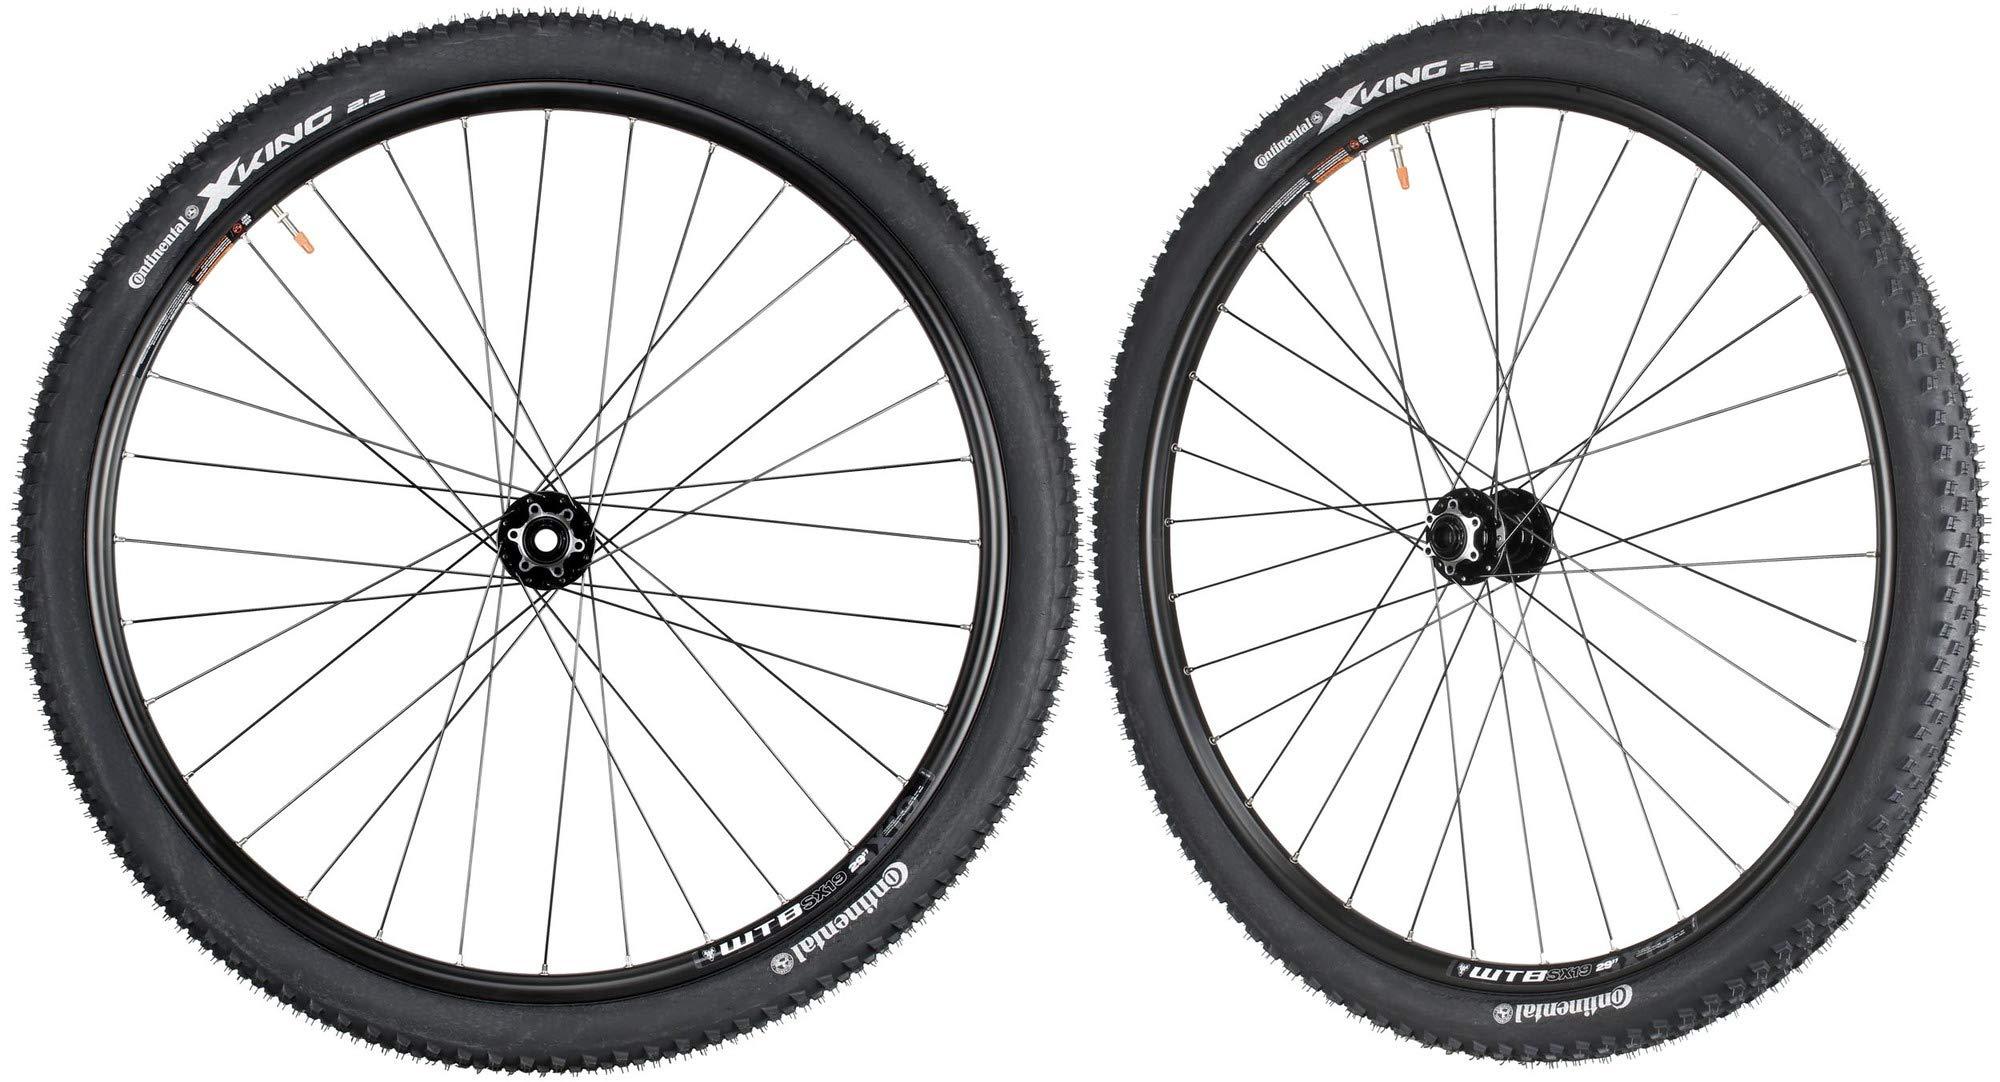 WTB SX19 Mountain Bike Wheelset 29'' Continental Tires Novatec Hubs Front 15mm Rear 12mm 11 Speed